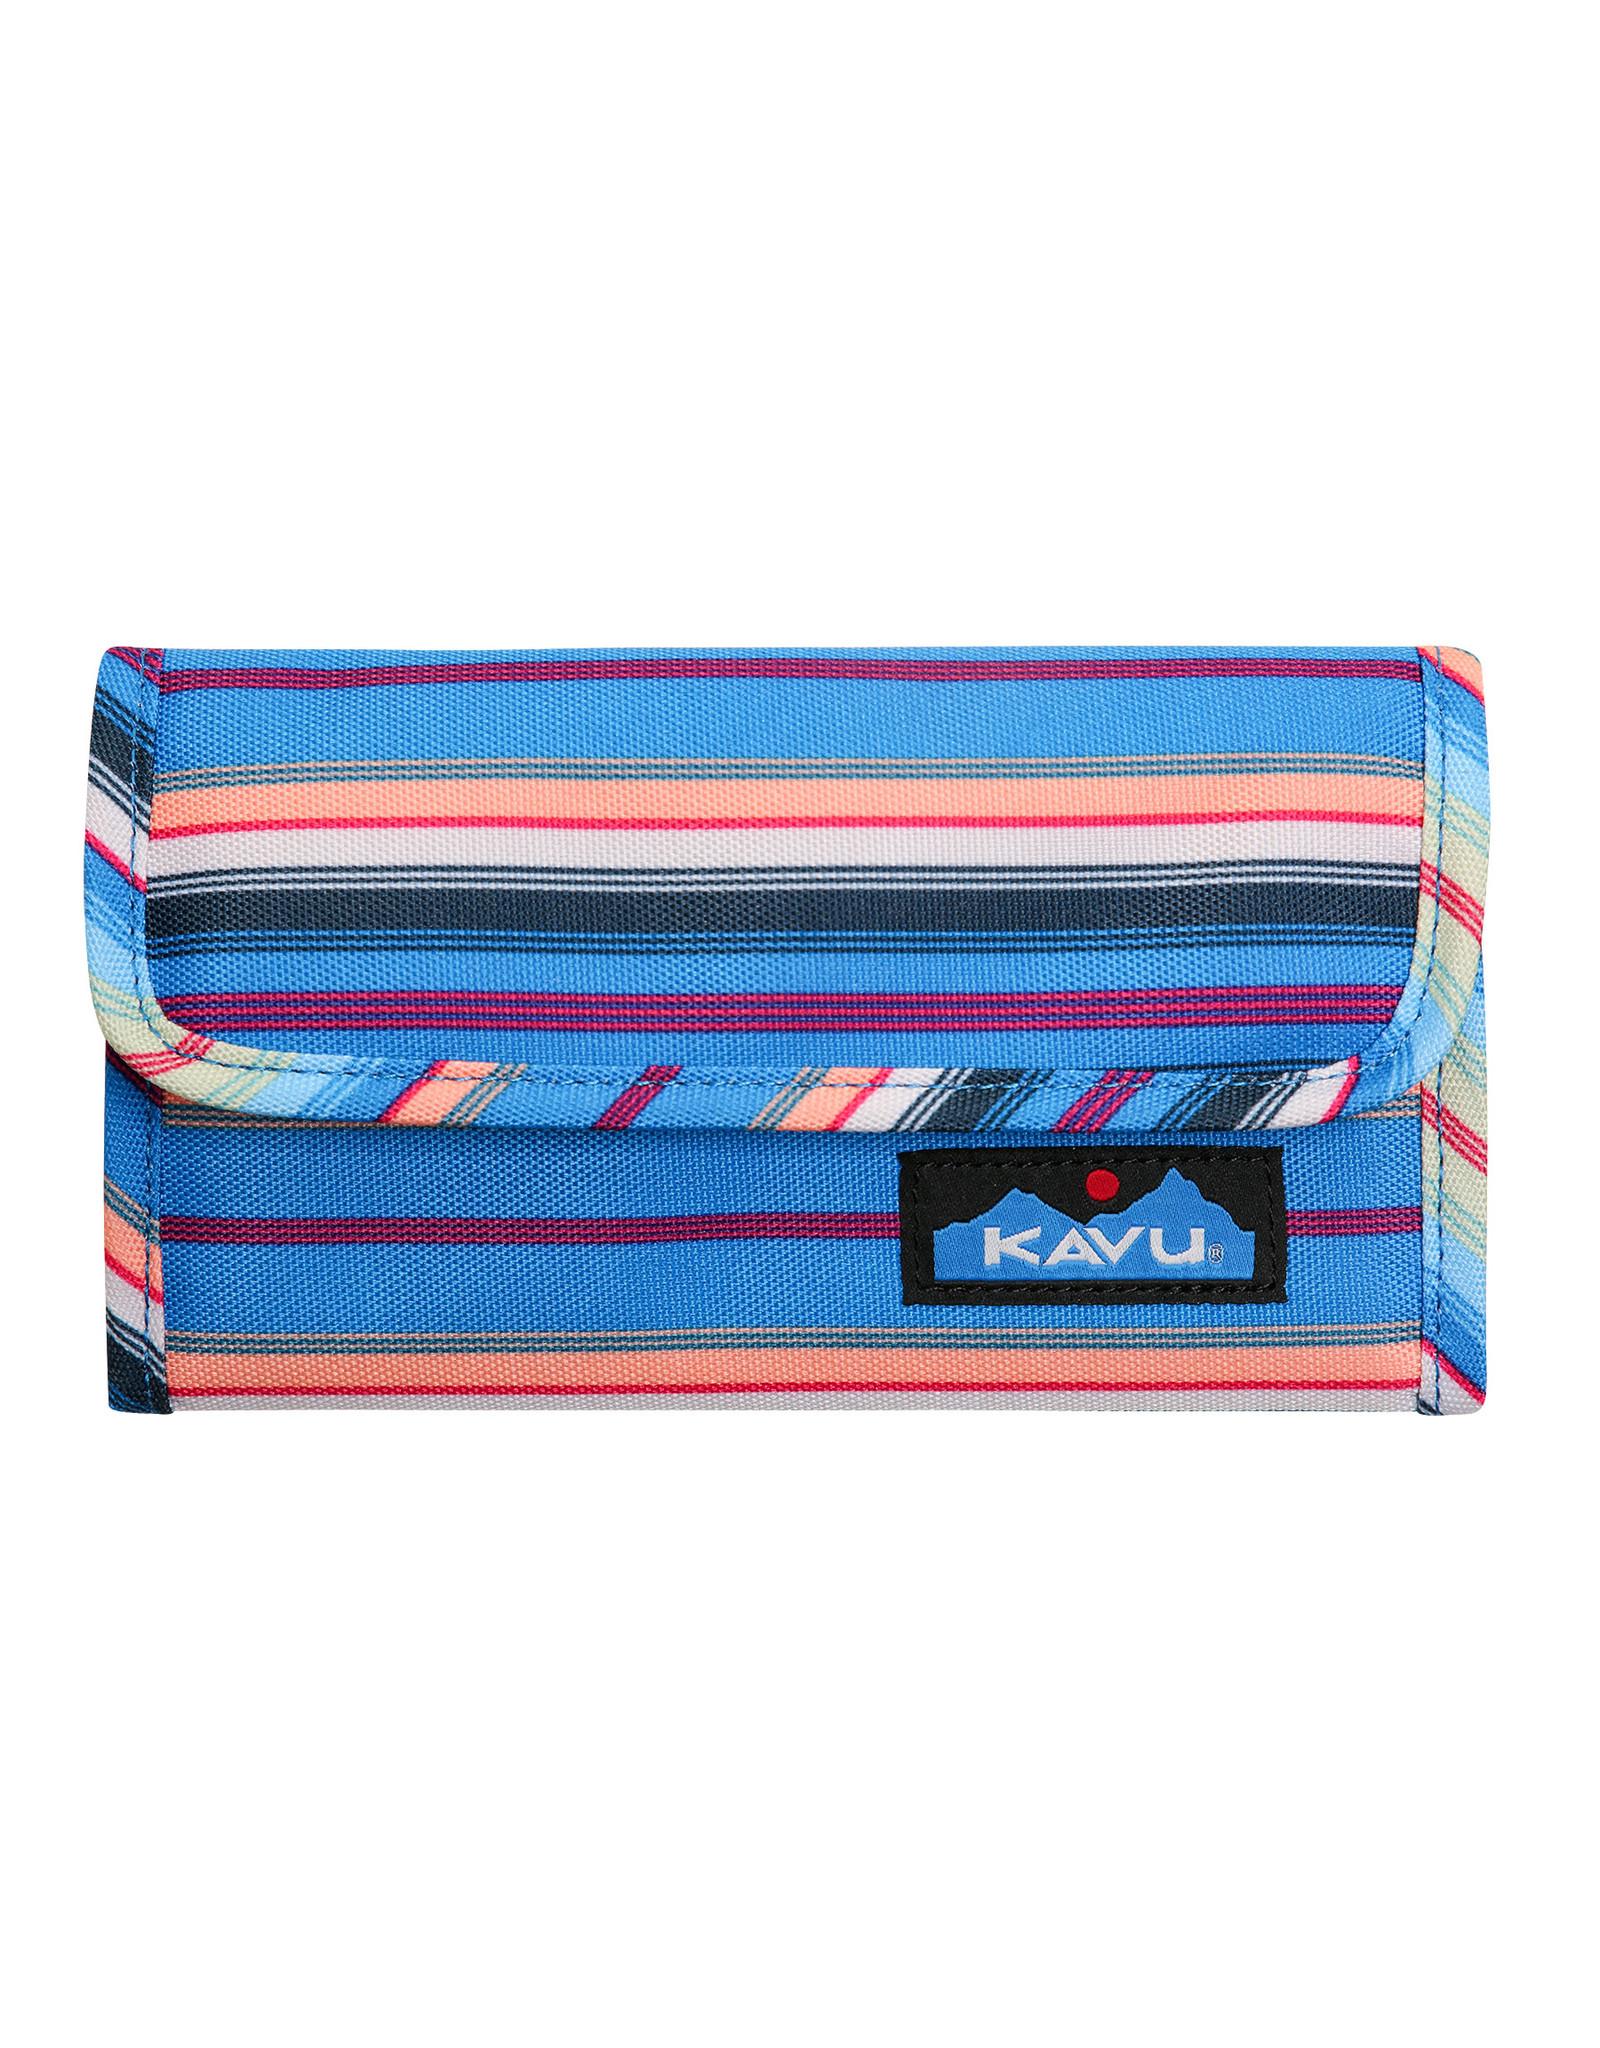 Kavu Mondo Spender - Playa Stripe